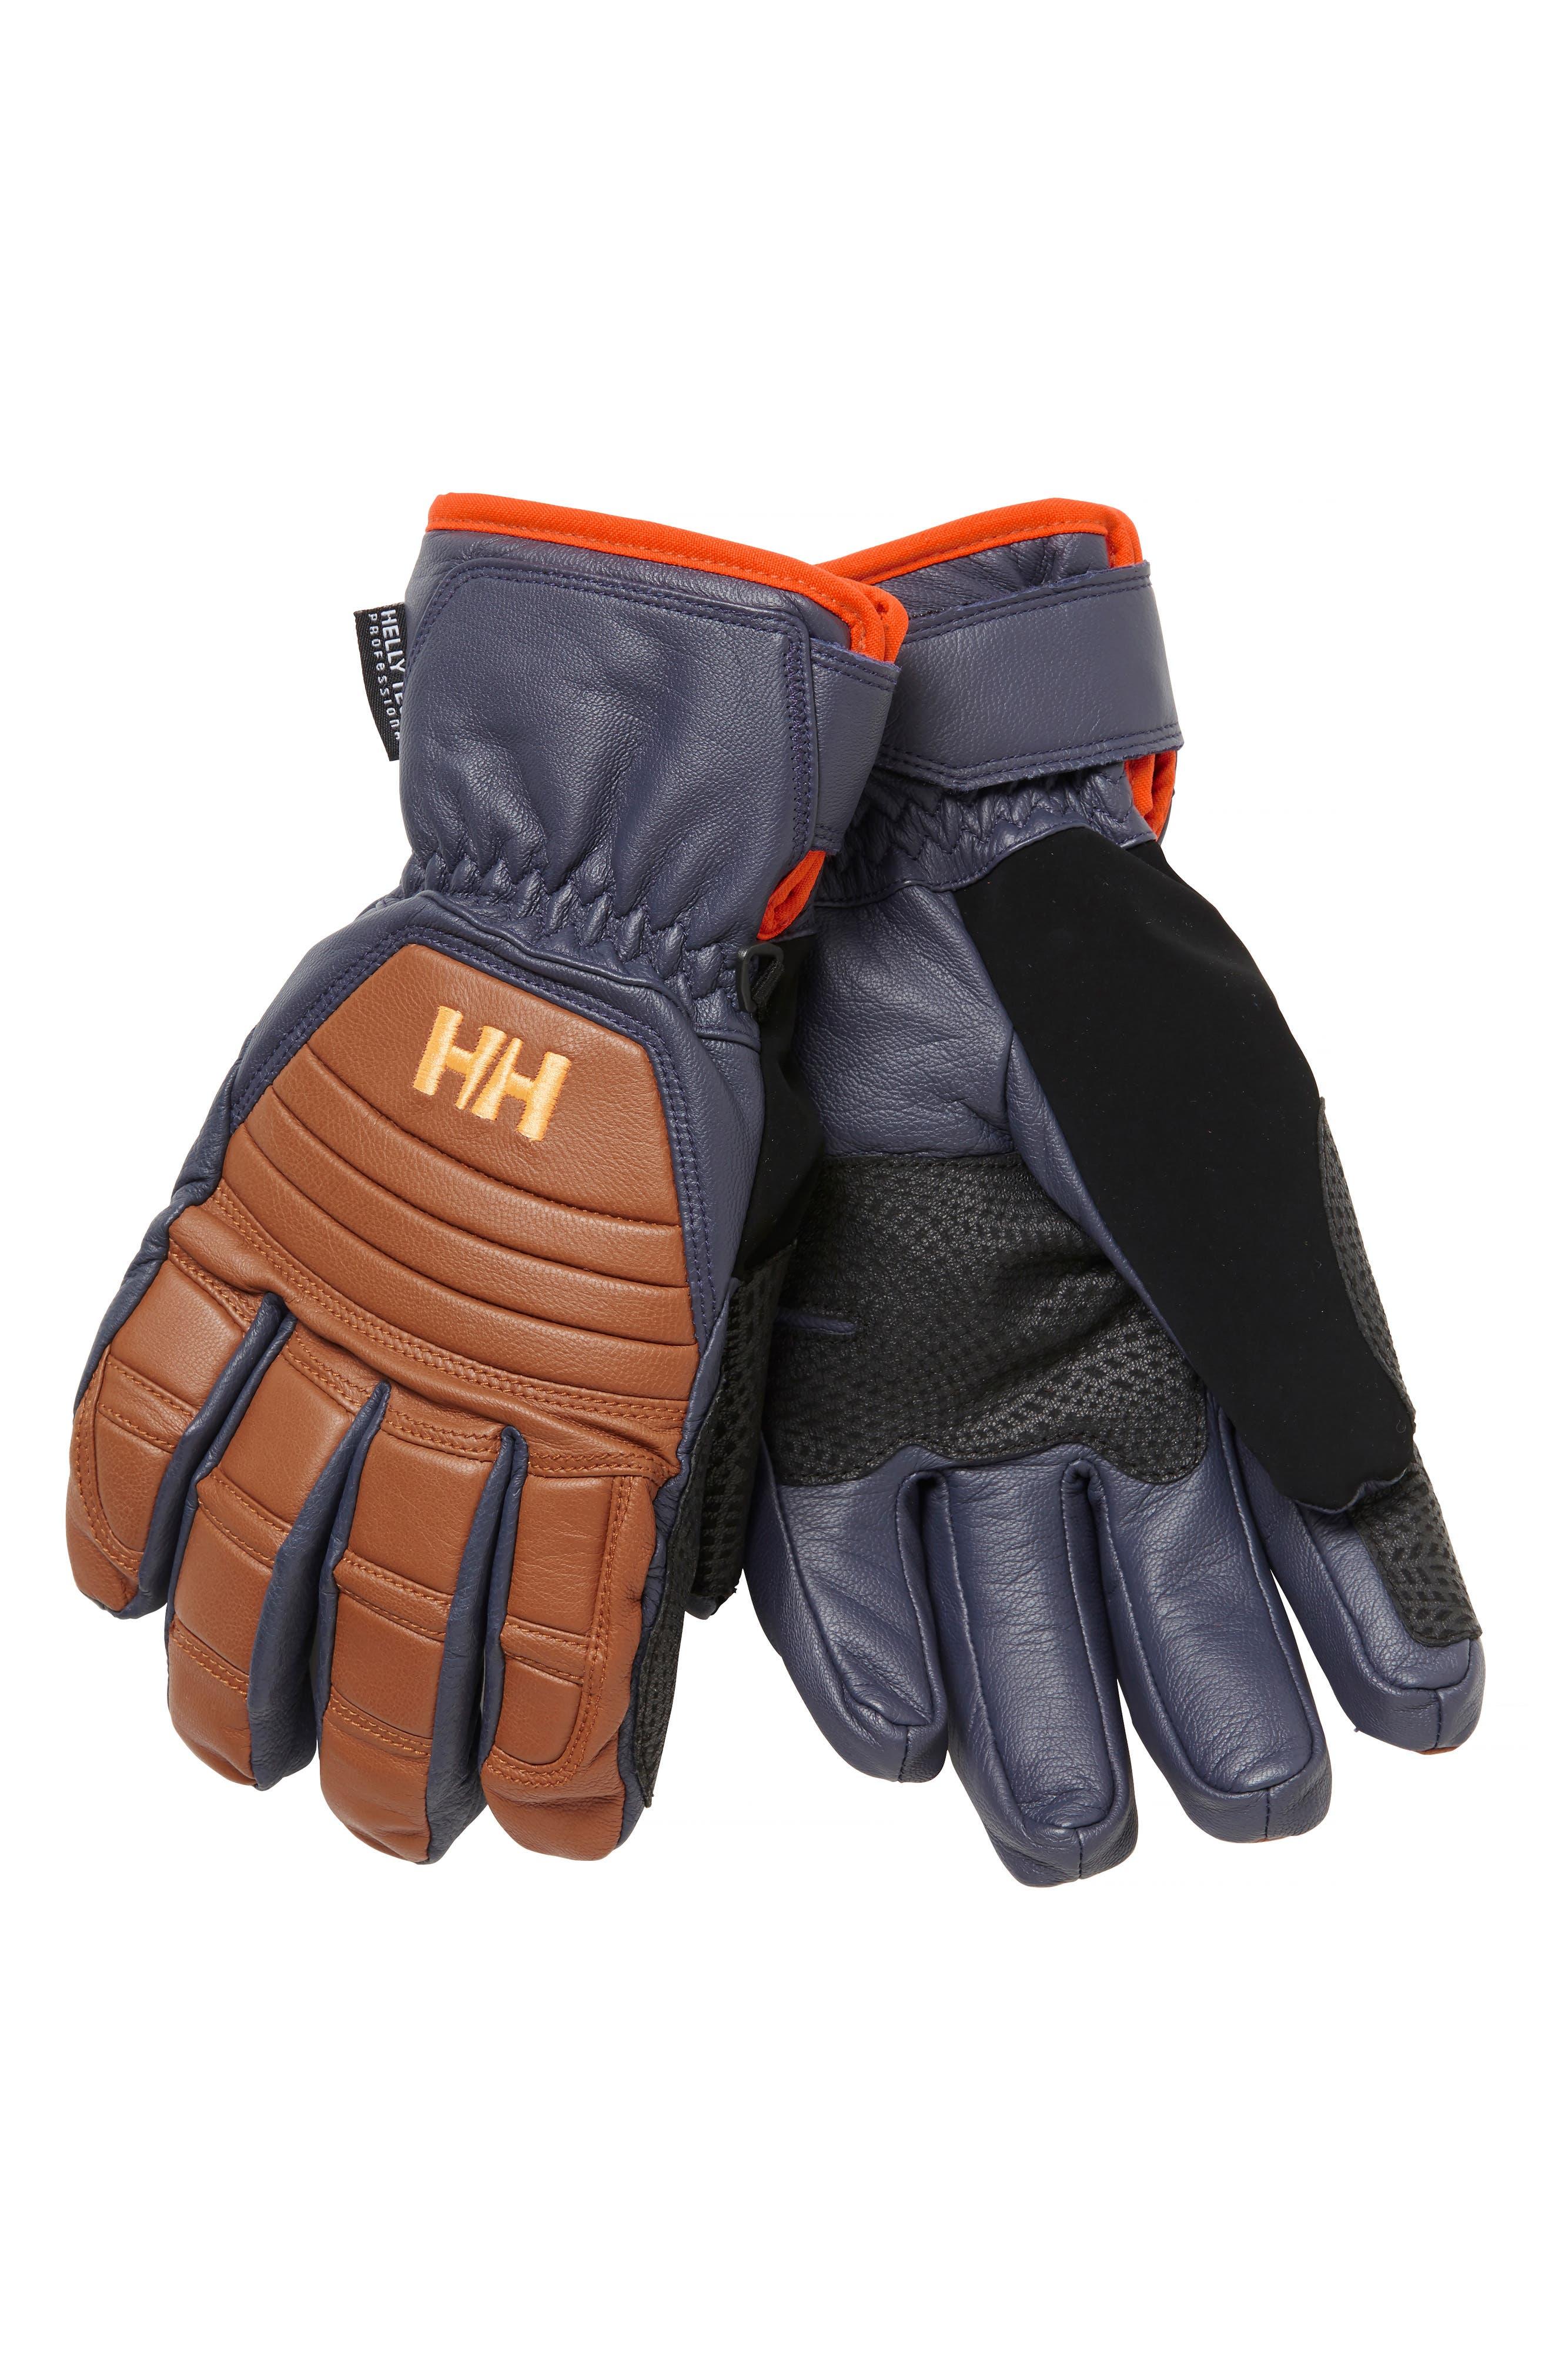 Ullr Leather Ski Gloves,                             Main thumbnail 1, color,                             CINNAMON / GRAPHITE BLUE